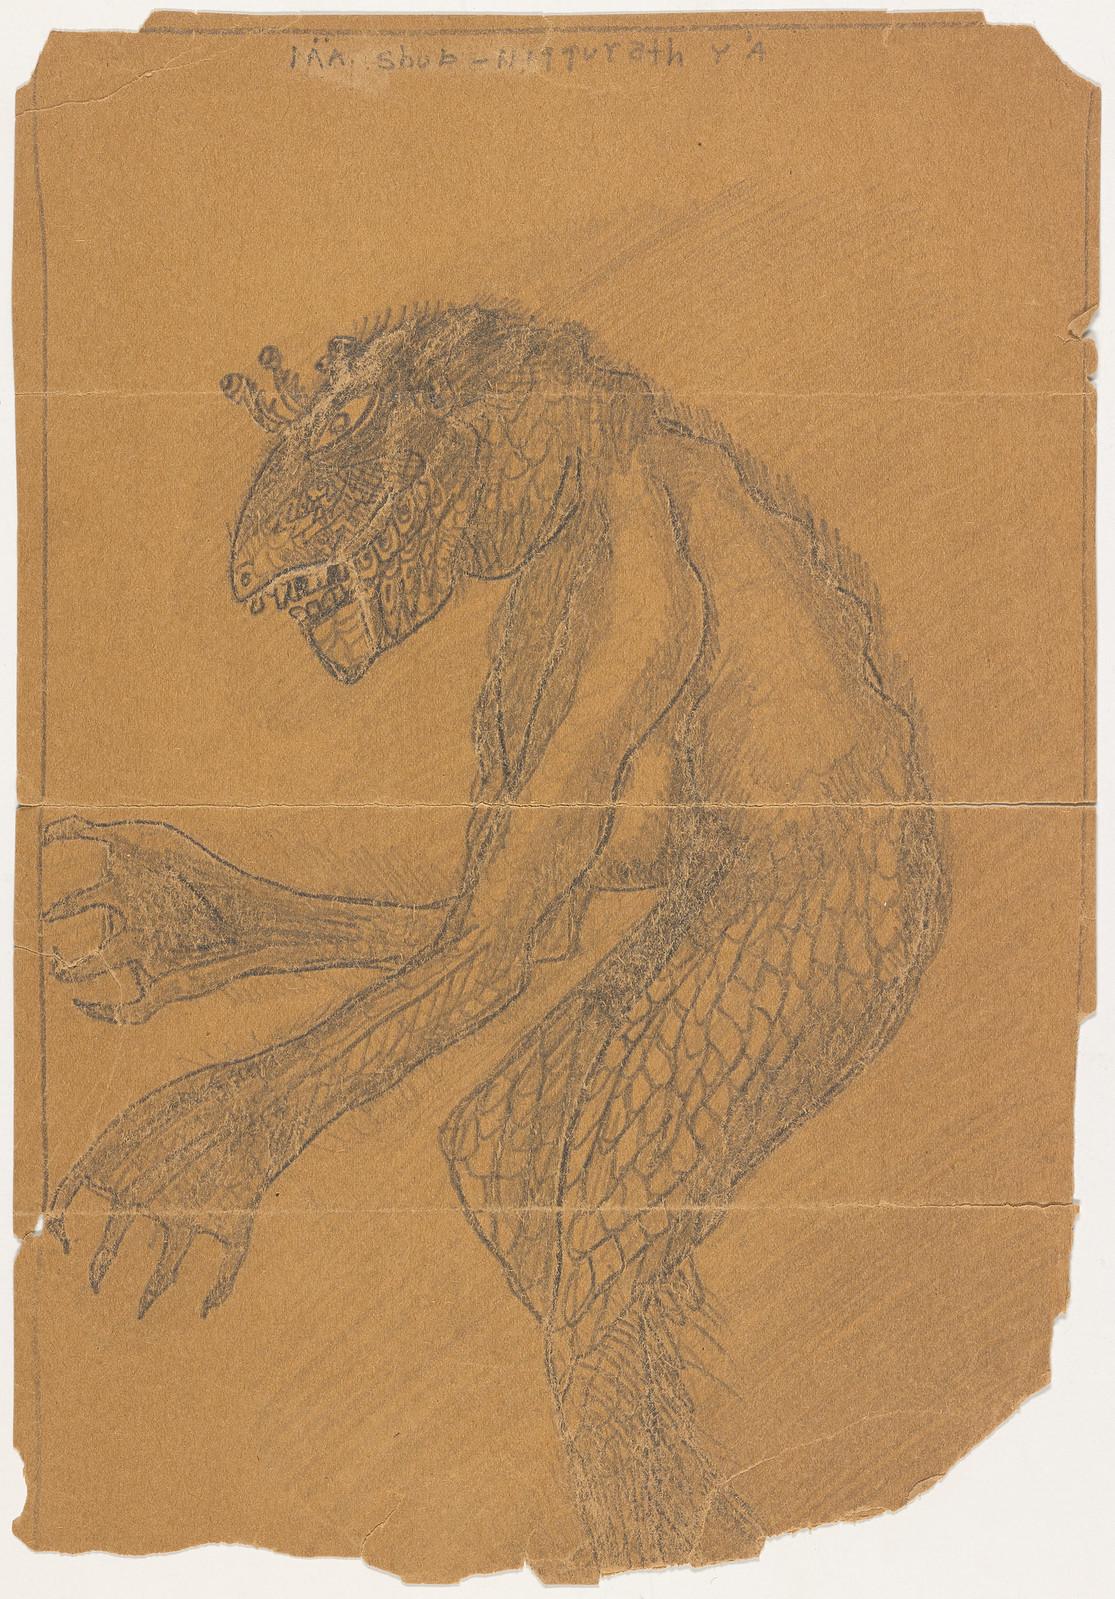 Robert Bloch - IÄA. Shub-Niggurath Y'A, 1933